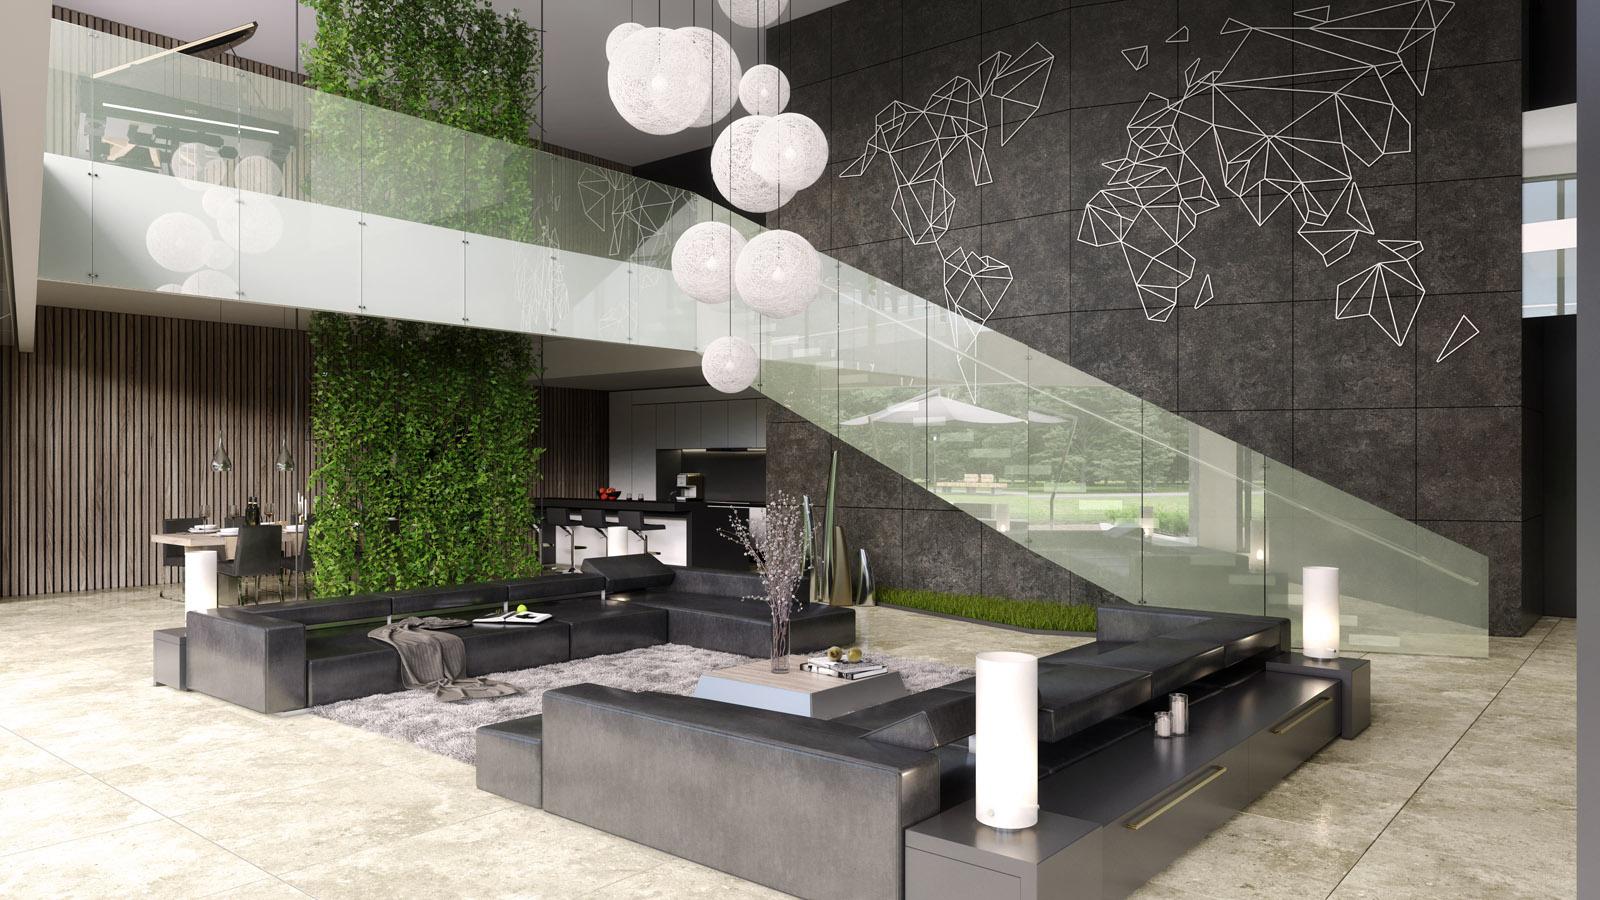 Luxe Interieur Ontwerp : D interieur ontwerpvisualisatie luxe woning choro